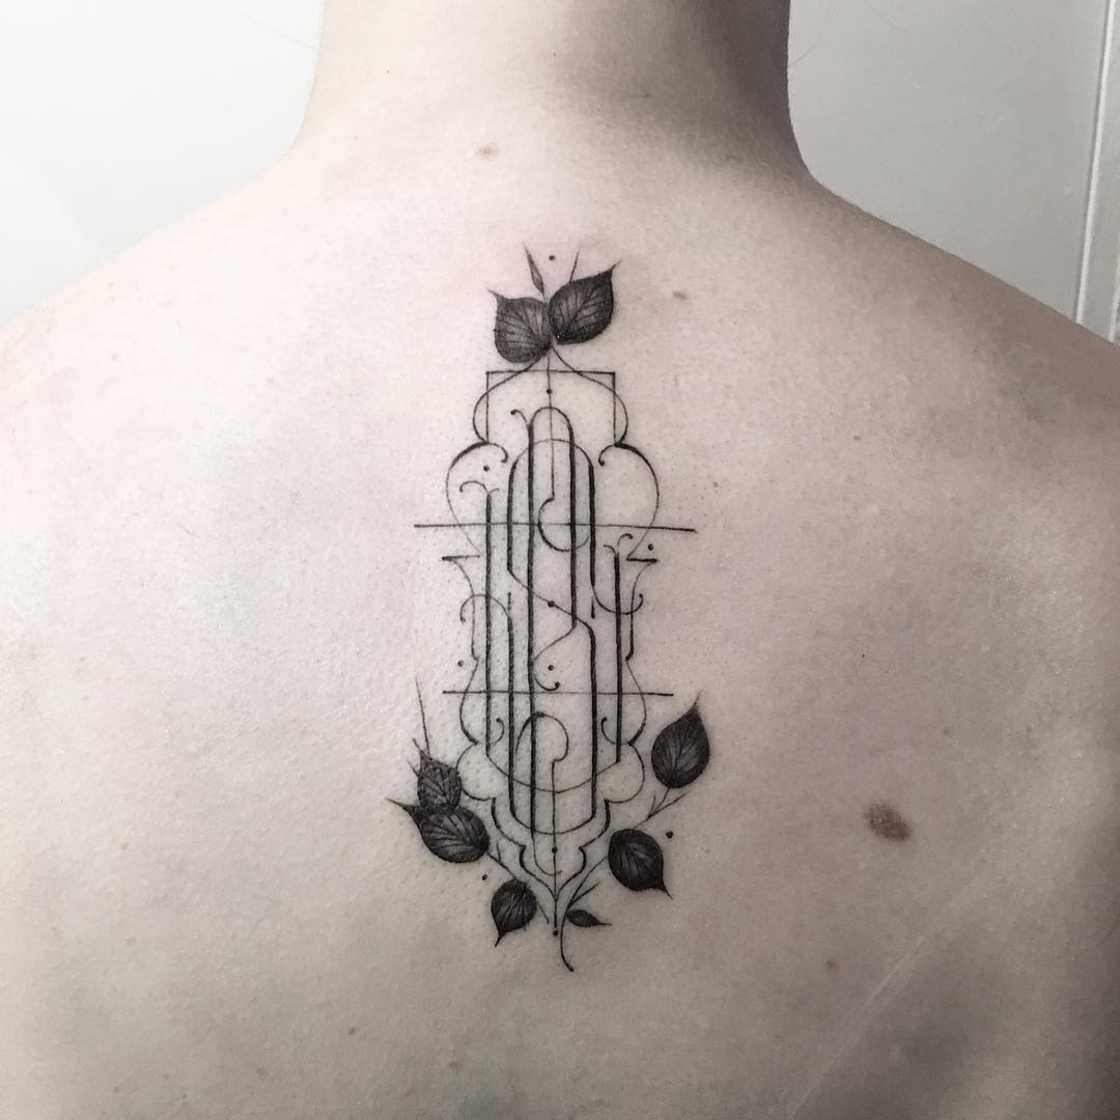 As tatuagens tipograficas delicadas de Leo Gavaggio